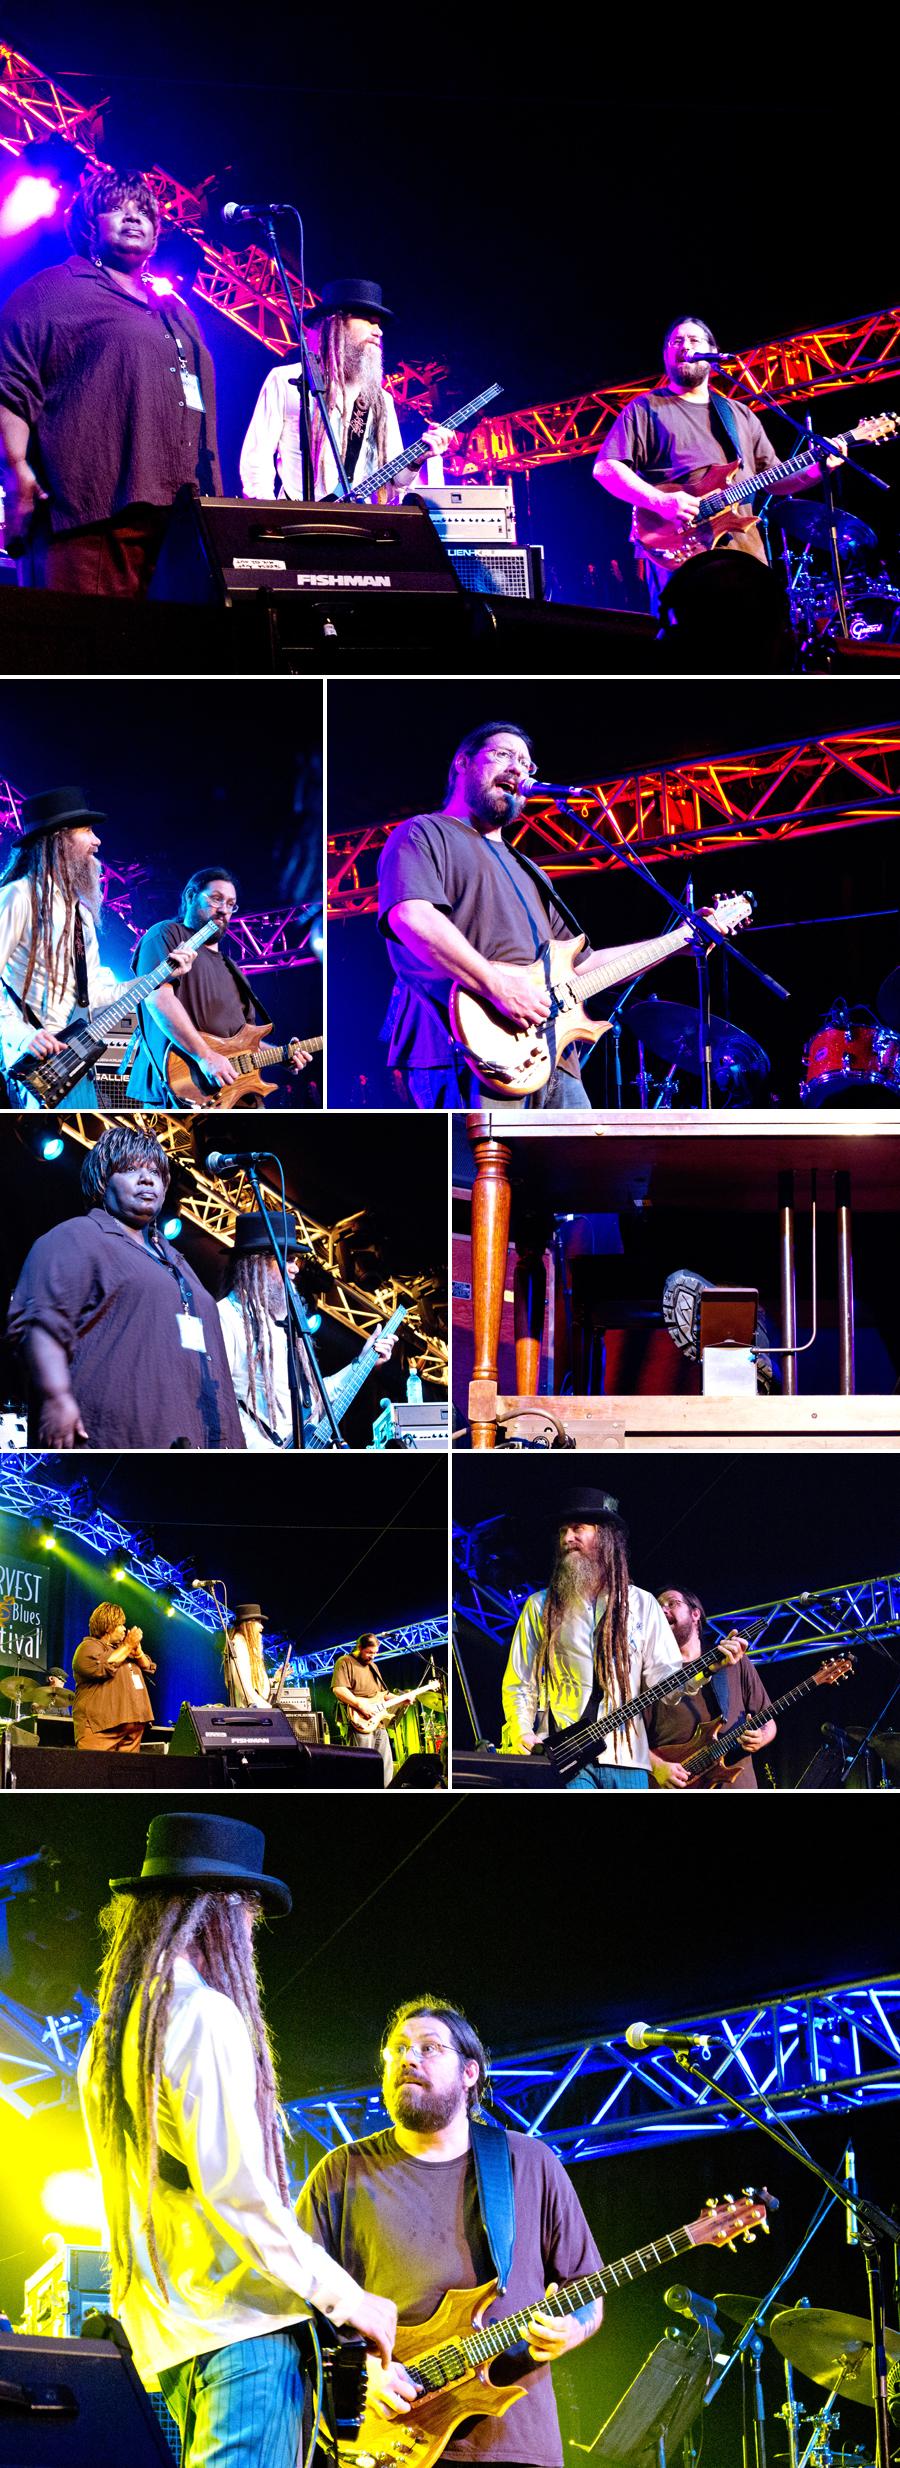 Harvest Jazz Amp Blues Festival 2011 Part 1 Fredericton Nb Kandise Brown Fredericton New